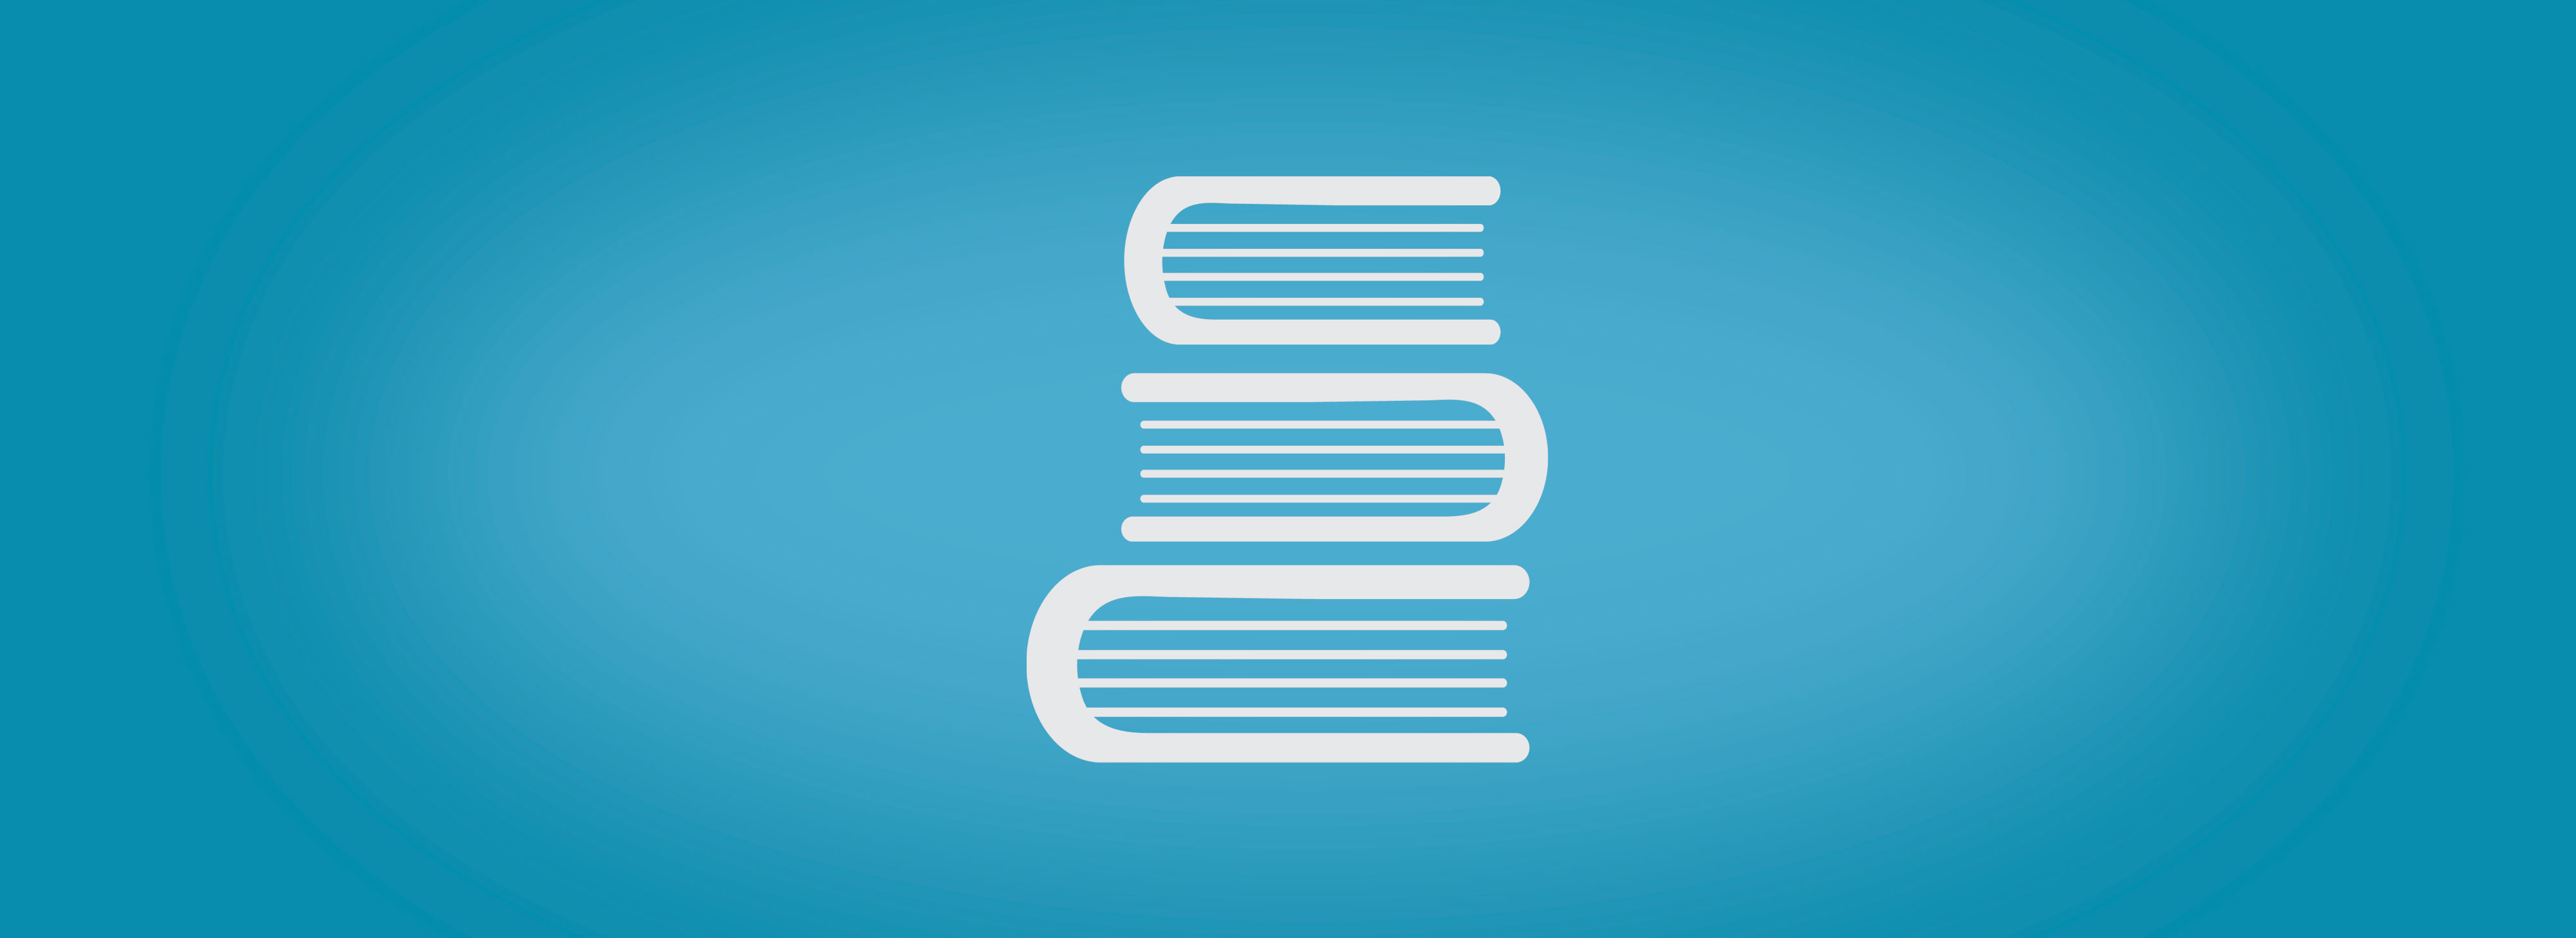 LAB-BEHRAKIS-PUBLICATIONS